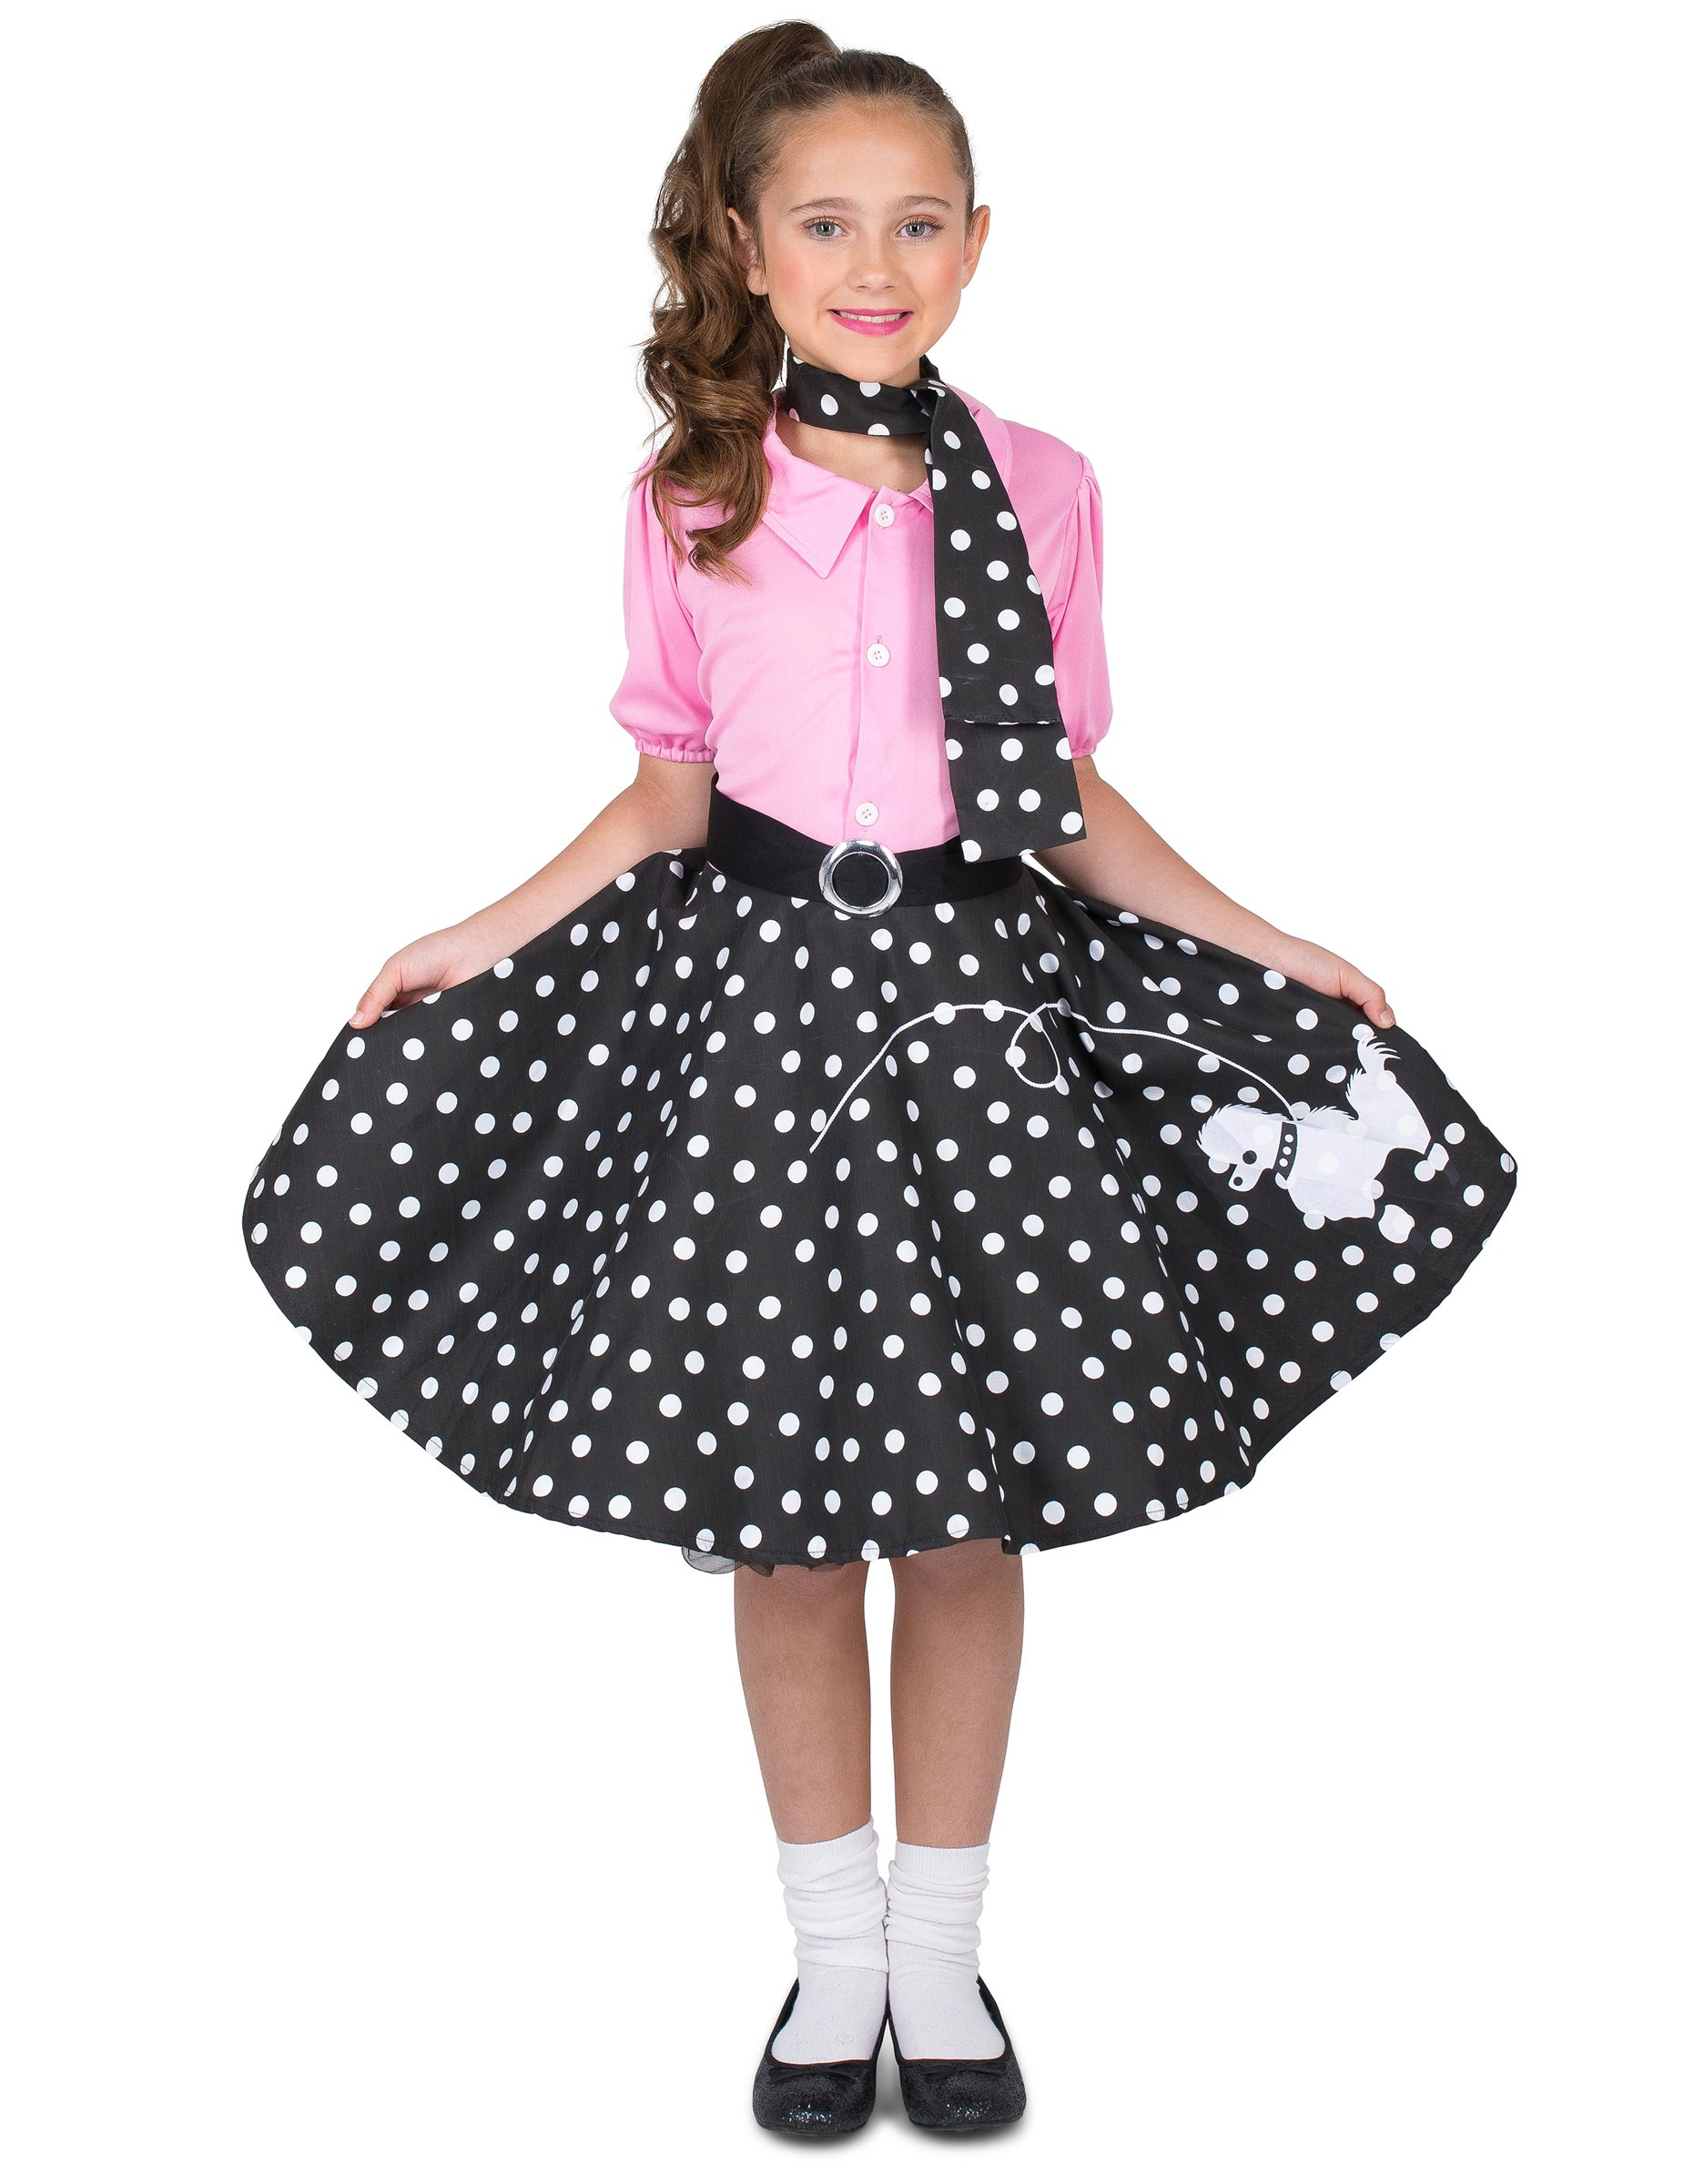 Costume anni  50 stile rock and roll bambina su VegaooParty b7dea9125ea